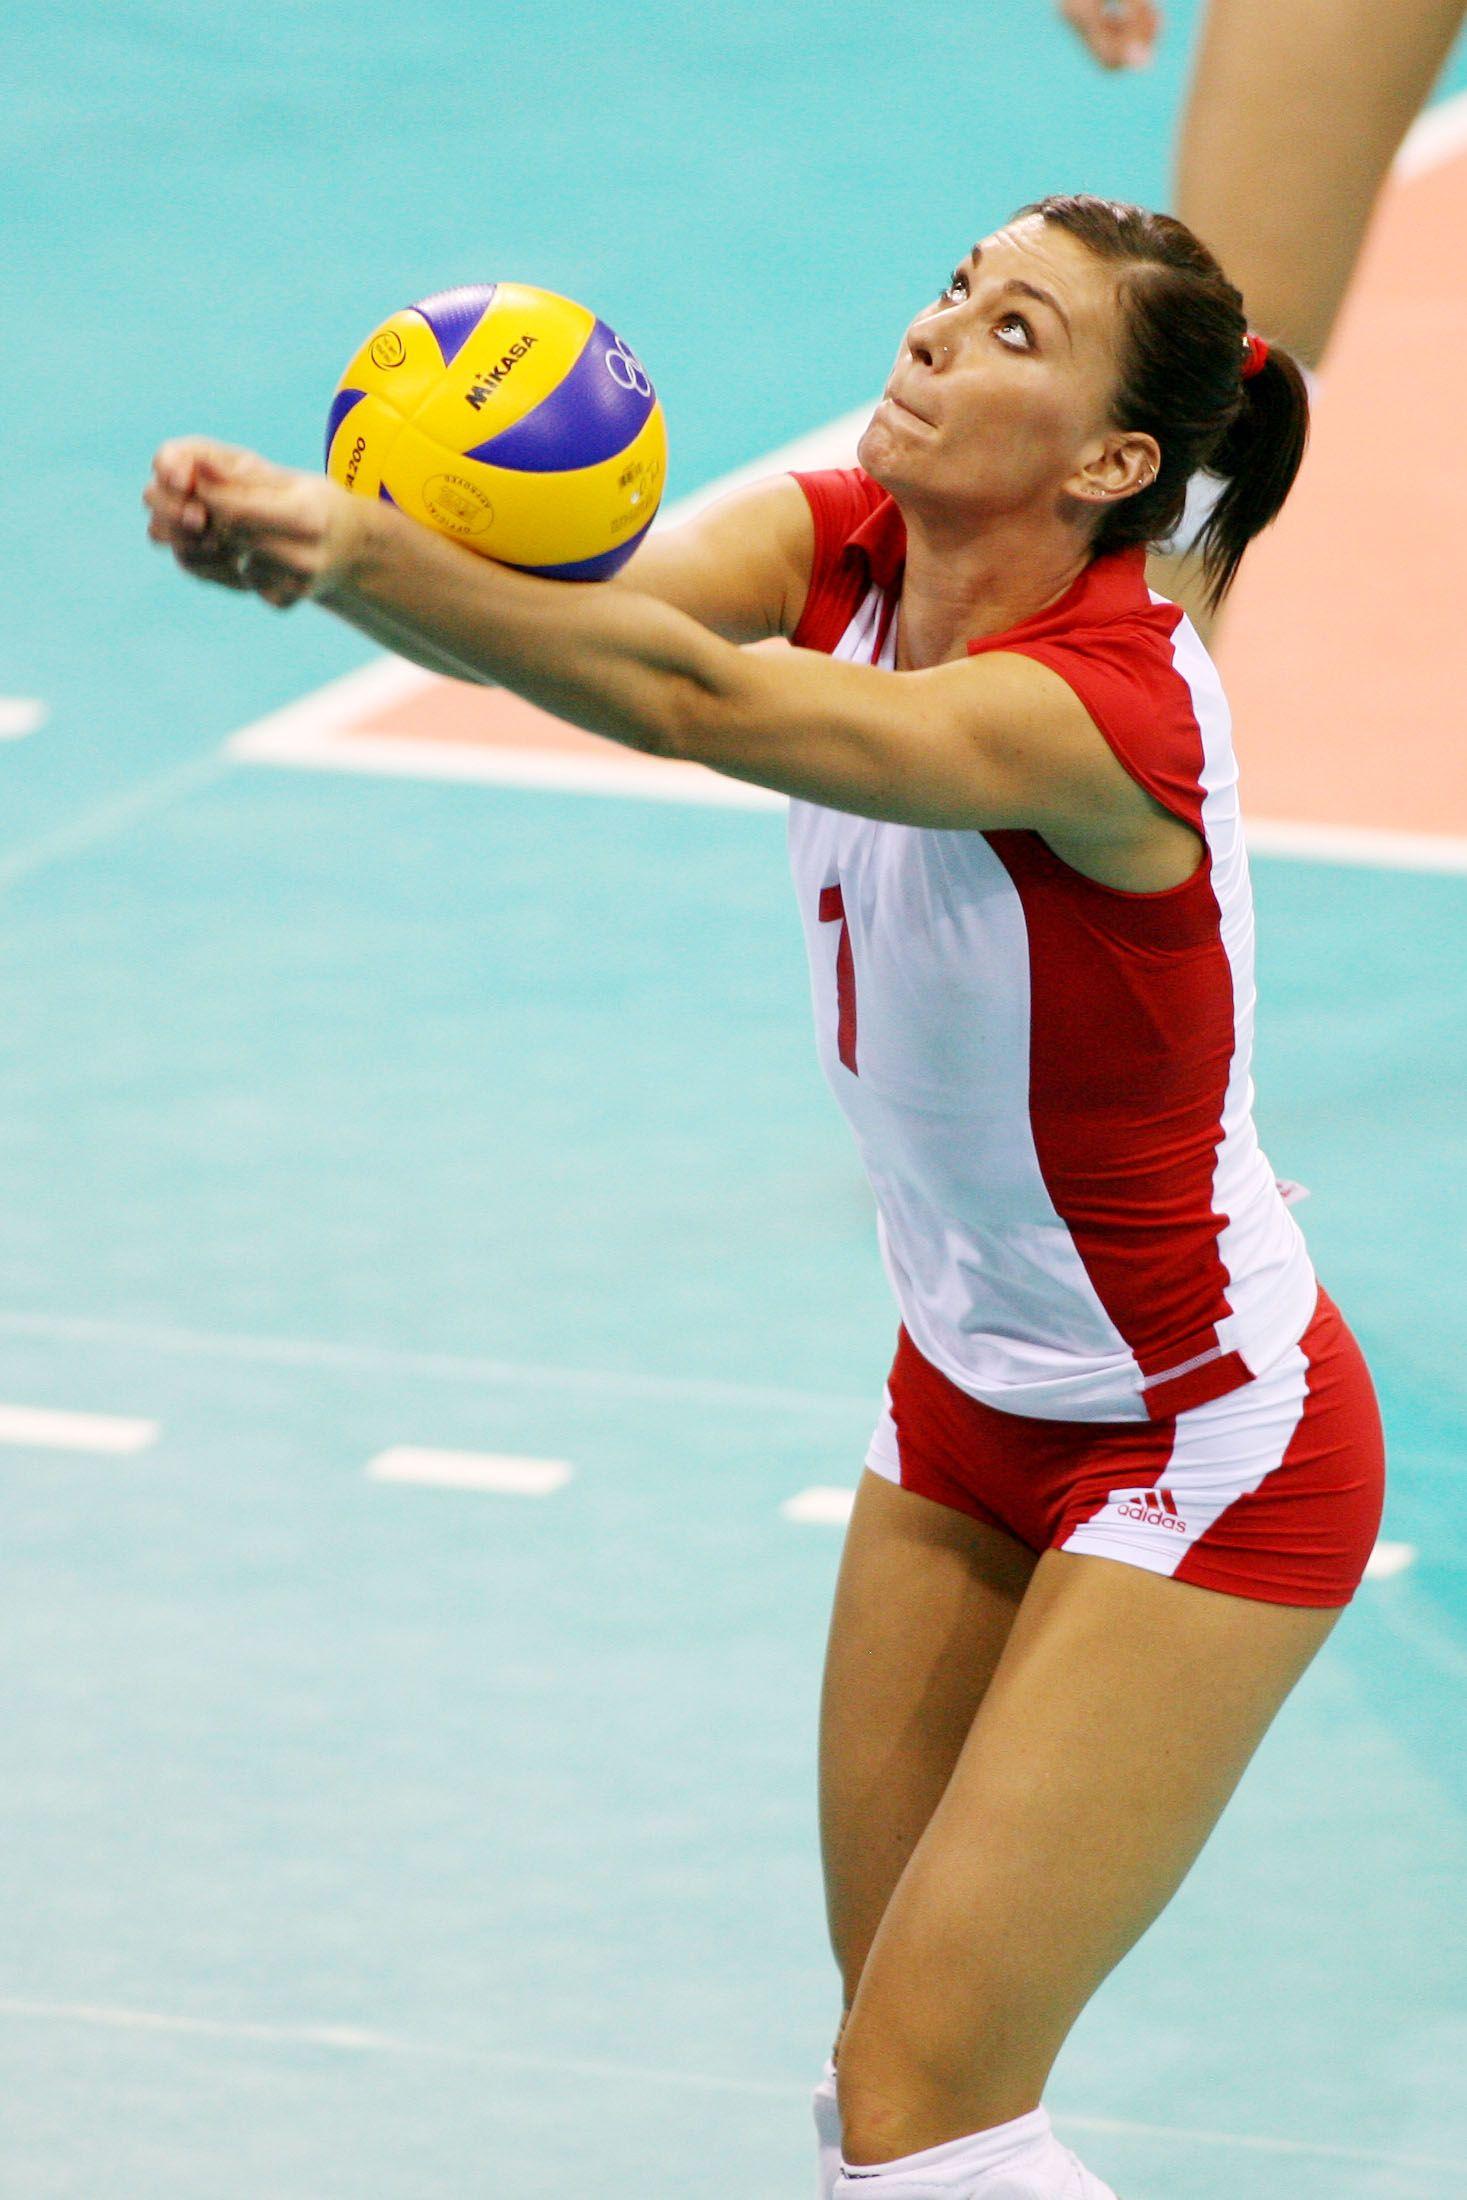 Katarzyna Ewa Skowronska Dolata Polish Volleyball Player Esportes Volei